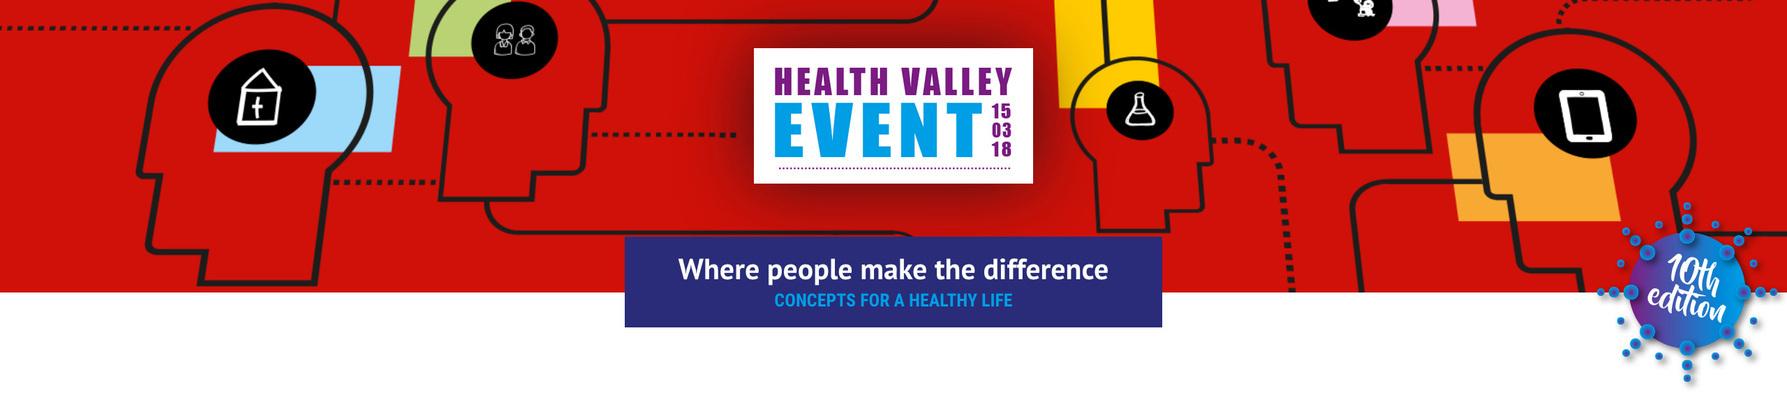 Health Valley Event 2018 - sponsoren